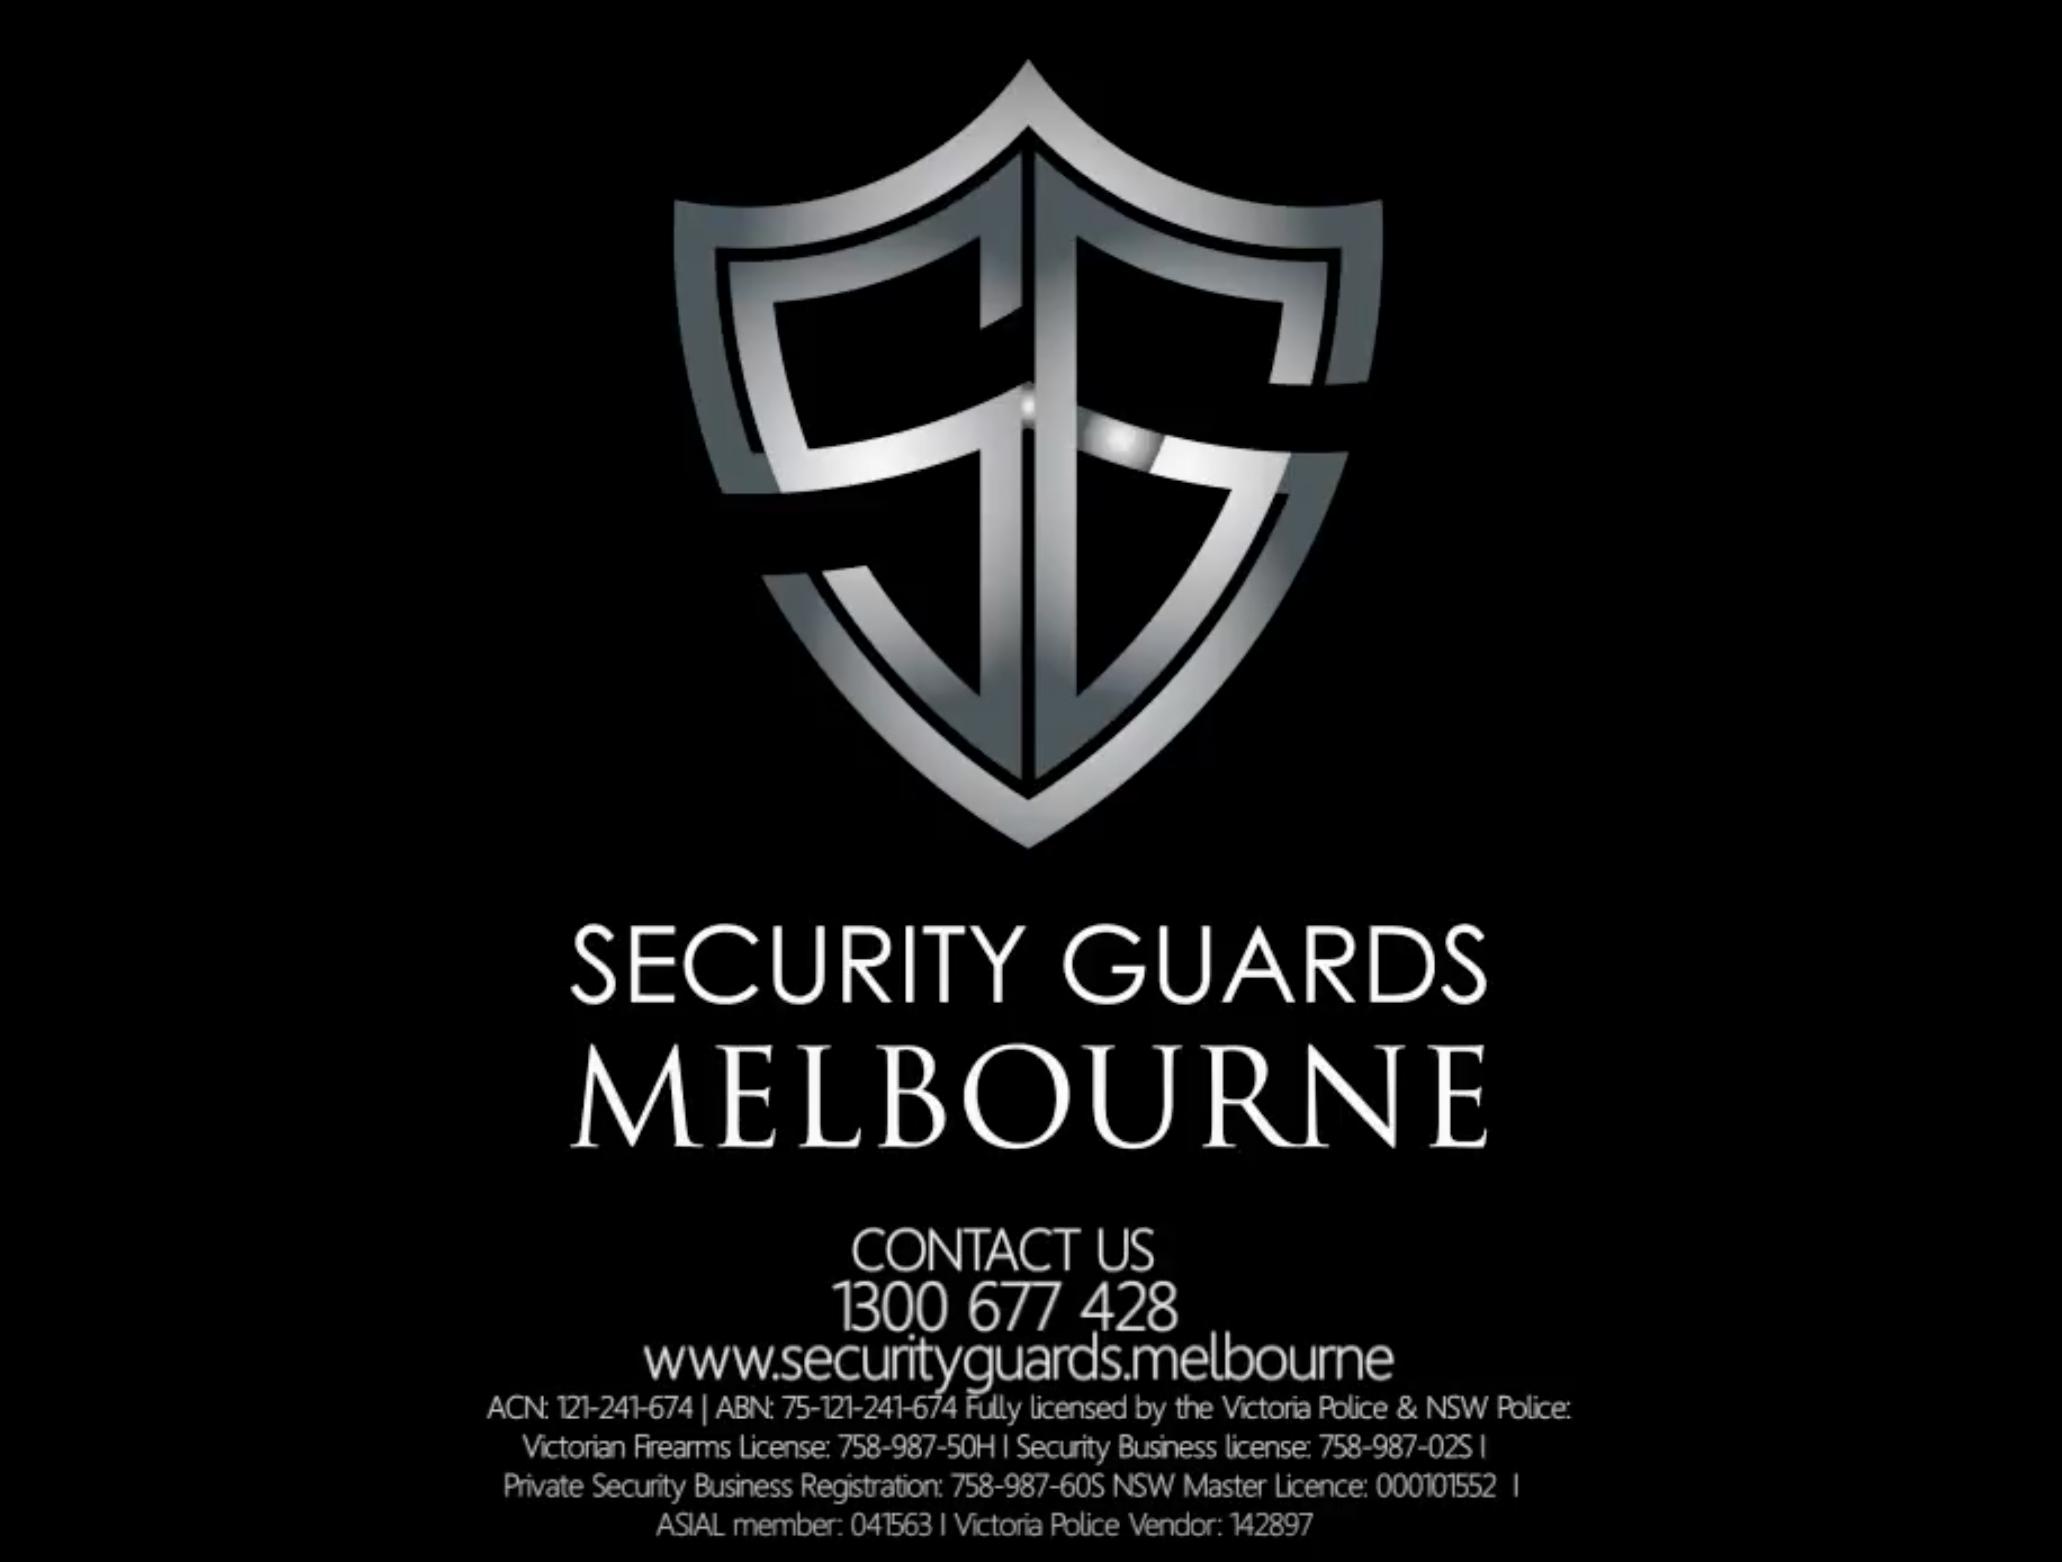 SPORT SECURITY GUARDS